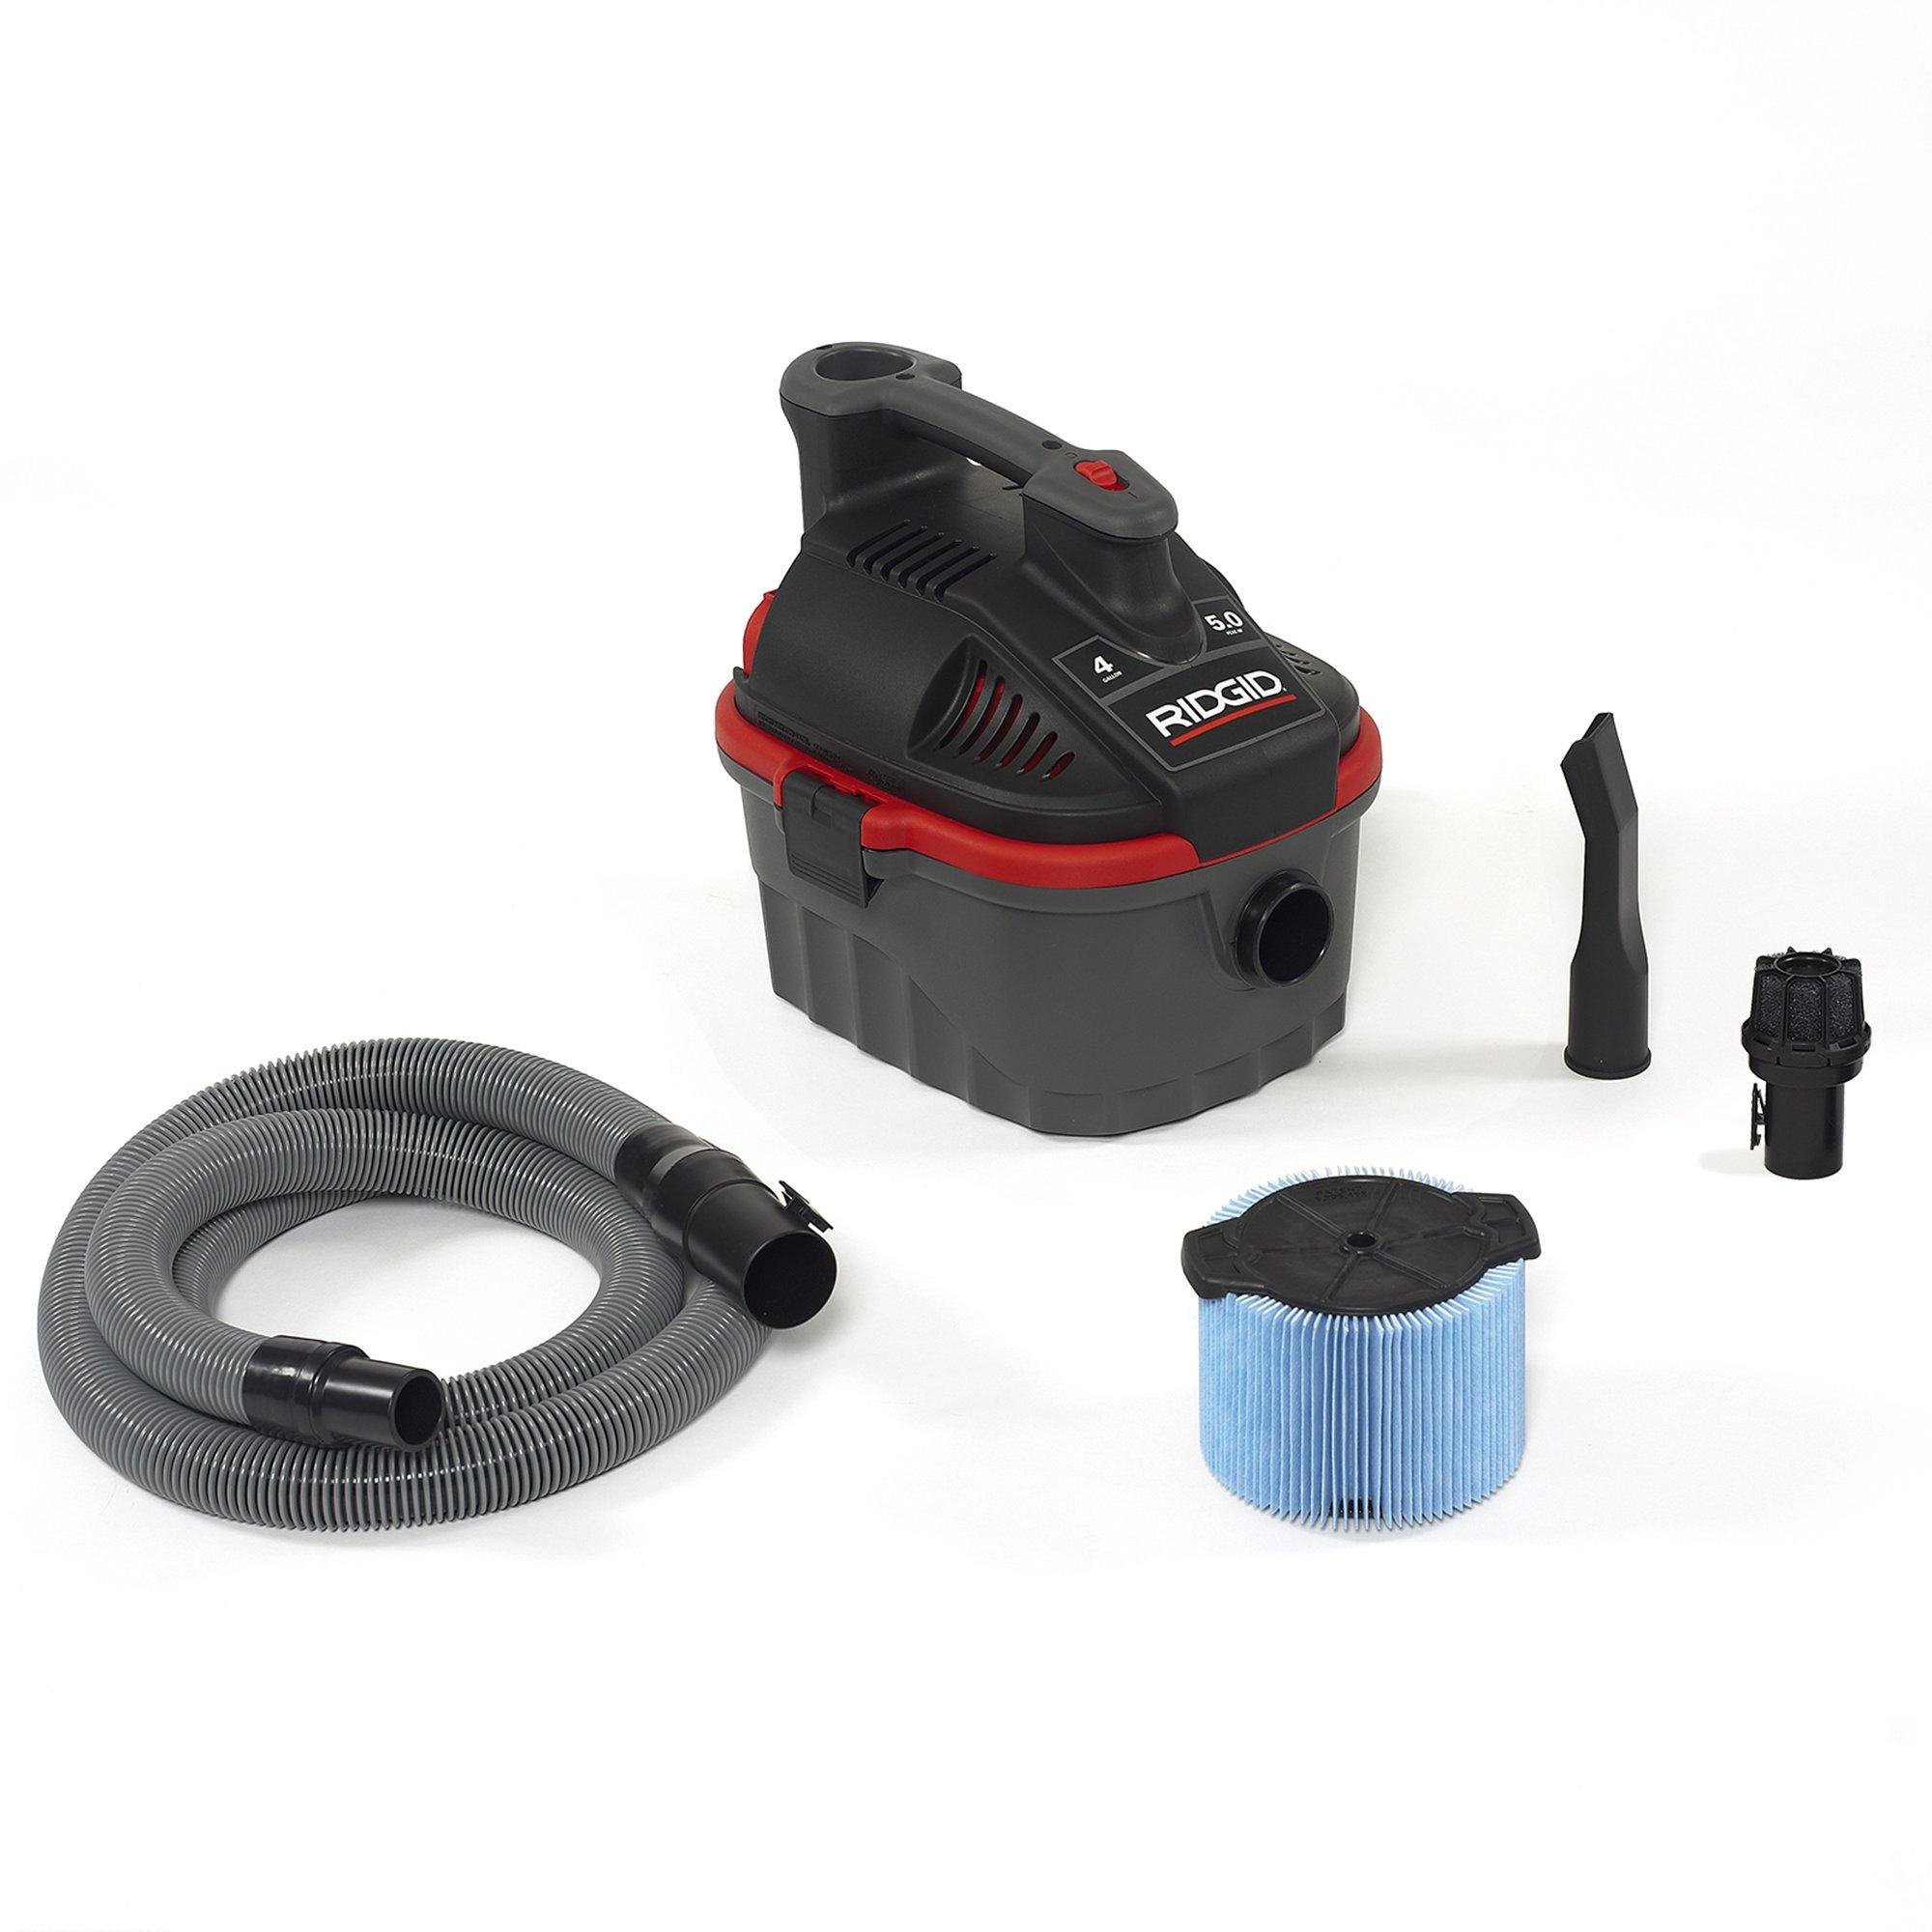 RIDGID 50313 4000RV Portable Wet Dry Vacuum, 4-Gallon Small Wet Dry Vac with 5.0 Peak HP Motor, Pro Hose, Ergonomic Handle, Cord Wrap, Blower Port by Ridgid